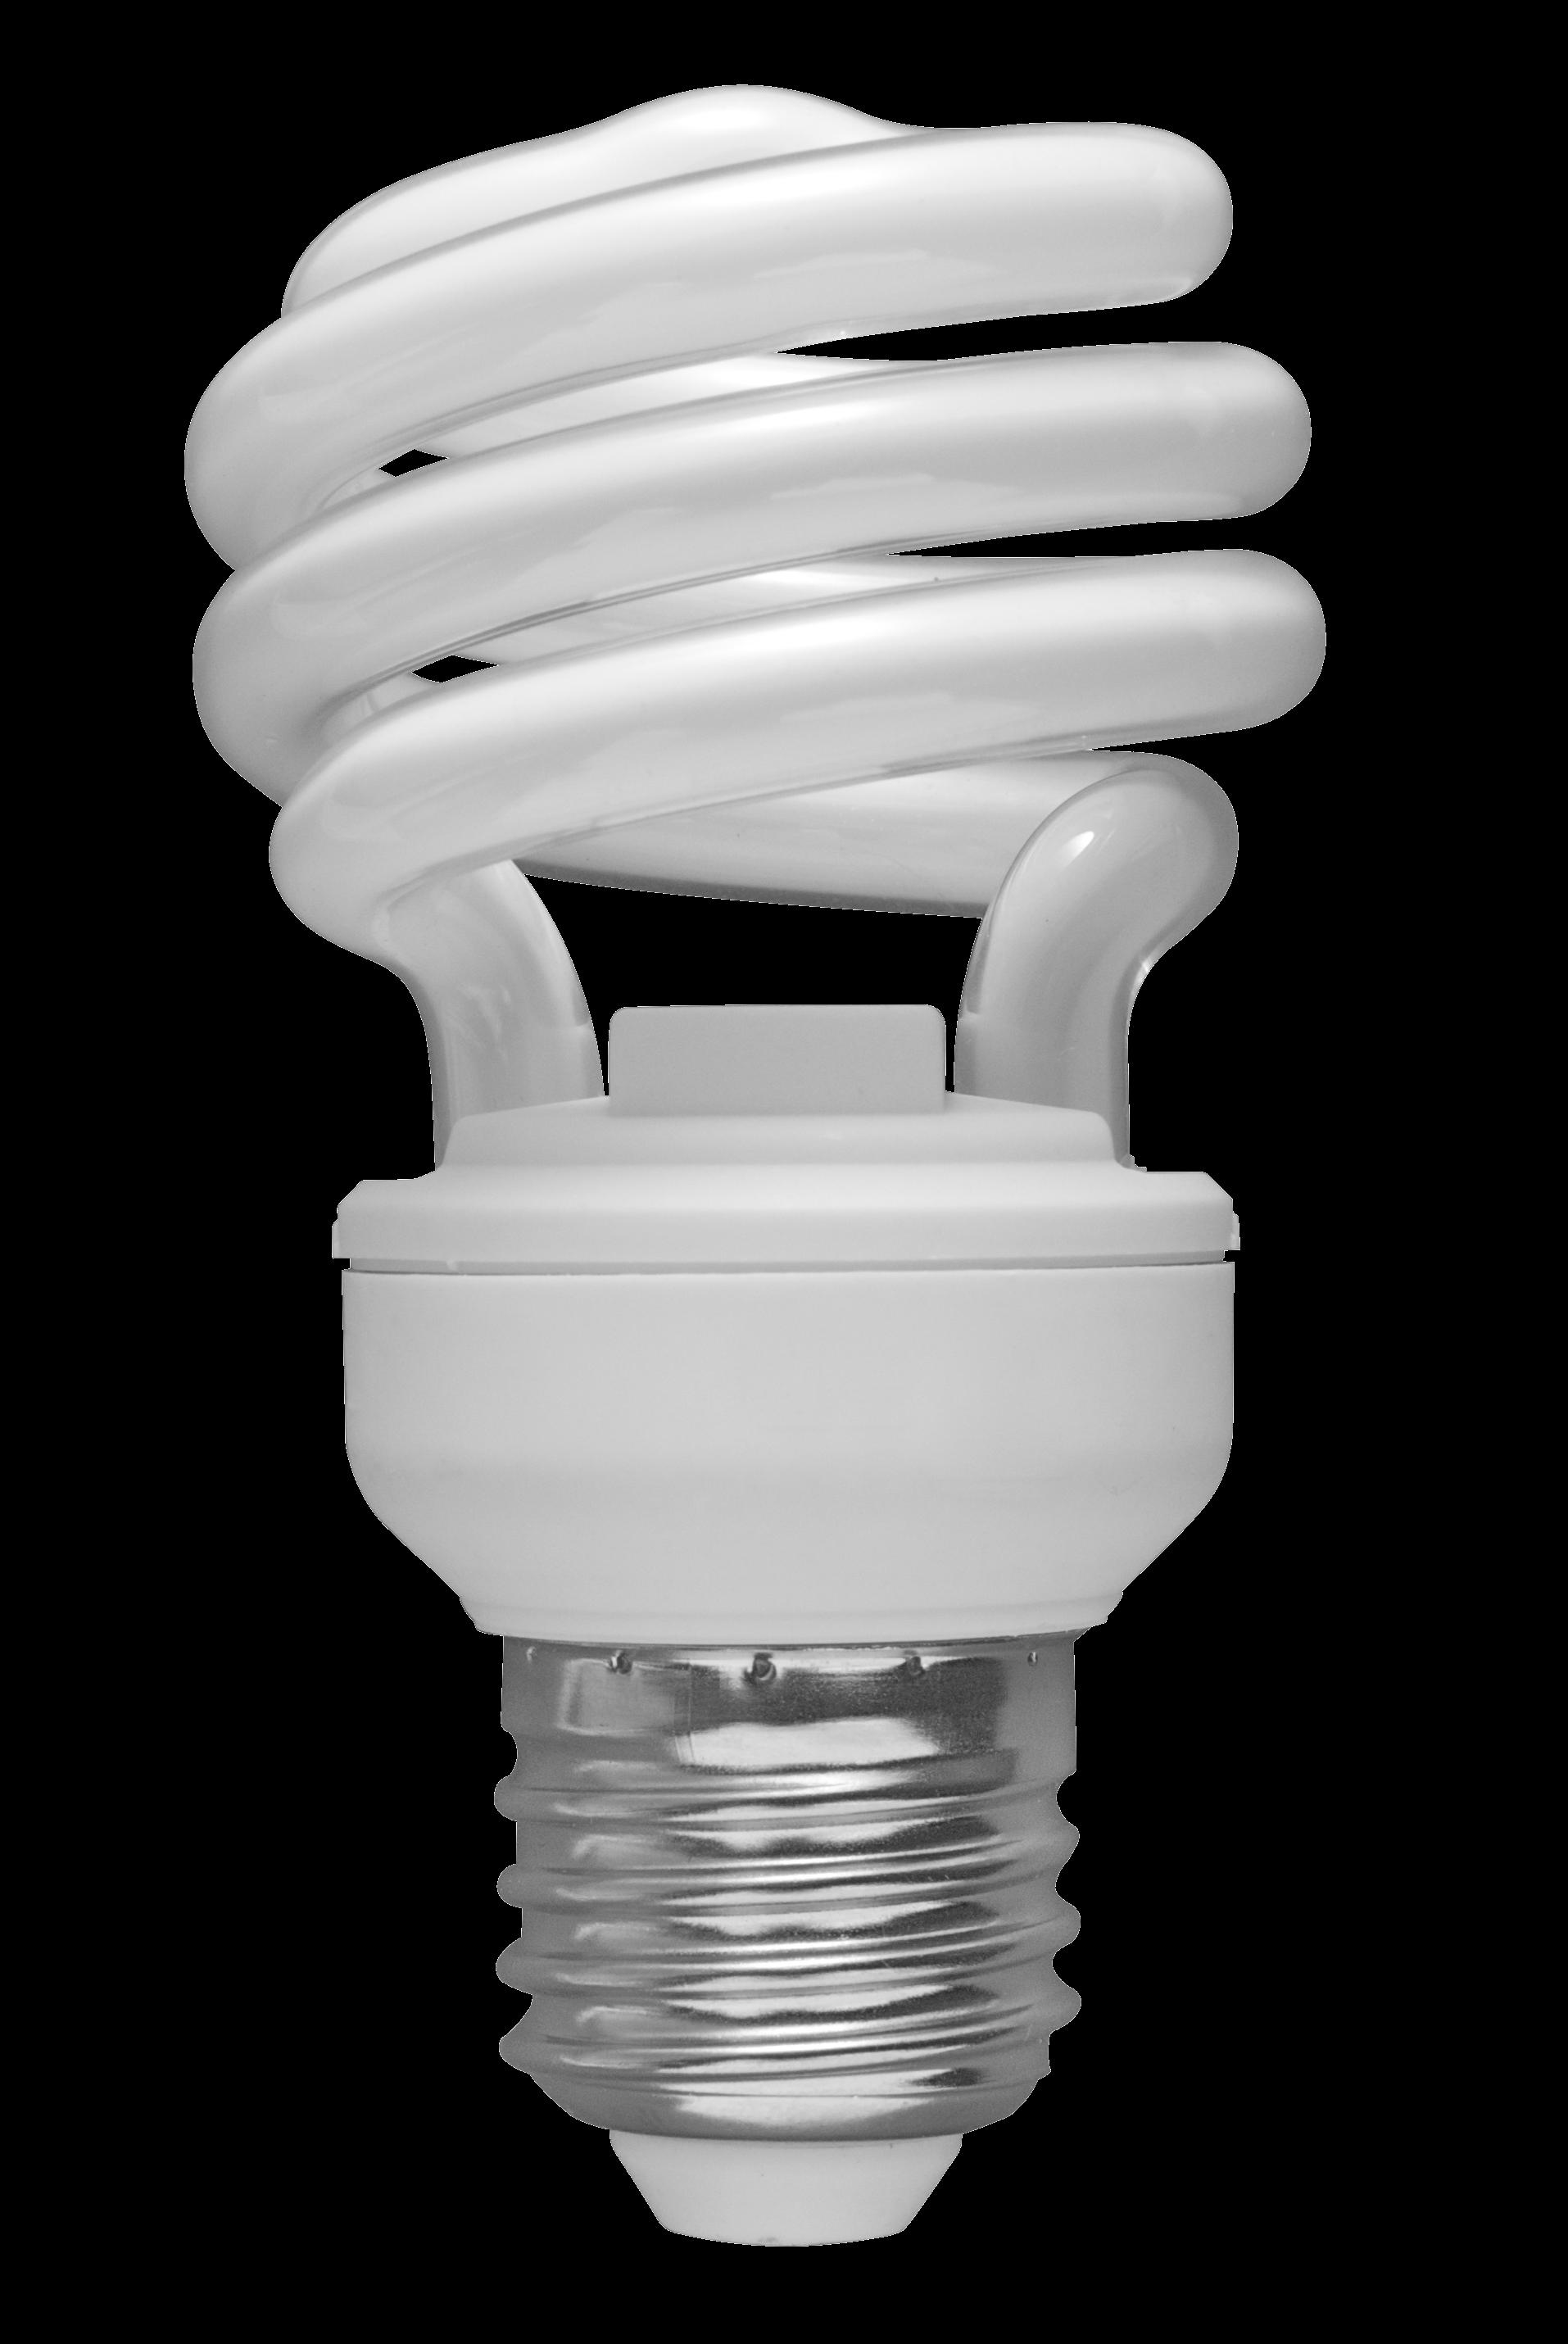 File:01 Spiral CFL Bulb 2010-